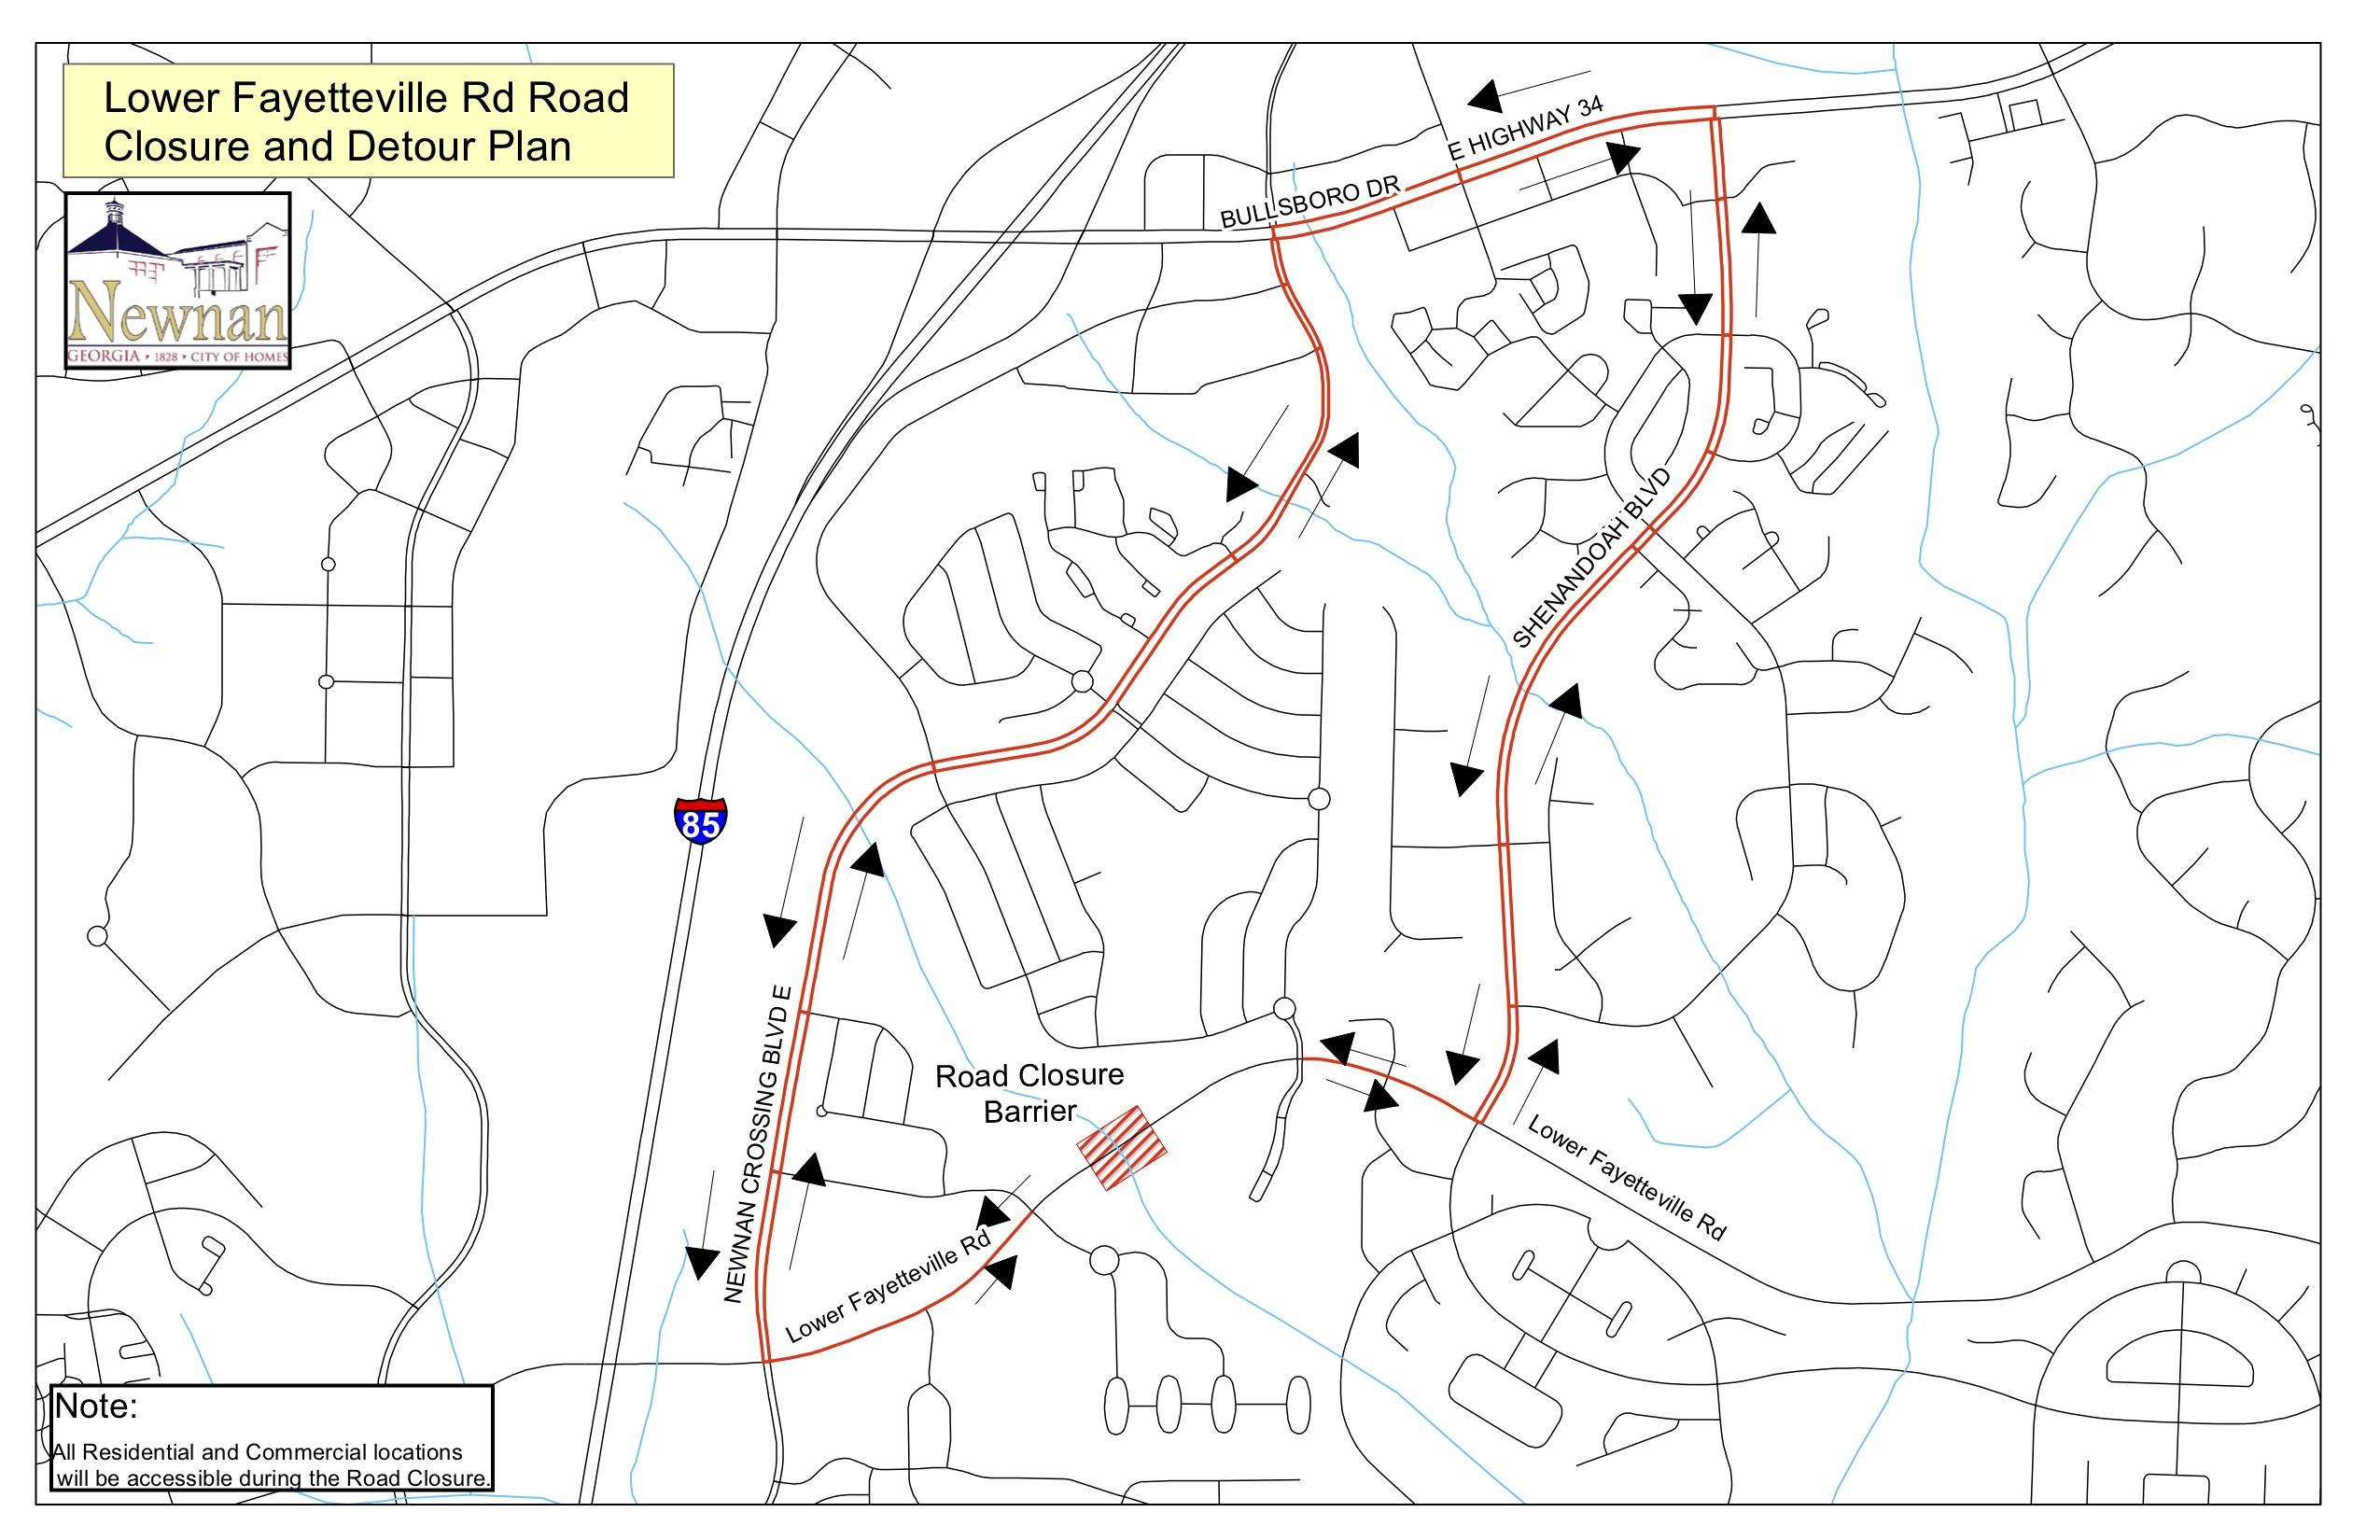 Newnan Georgia Map.City Plans 30 Day Detour On Lower Fayetteville The Newnan Times Herald